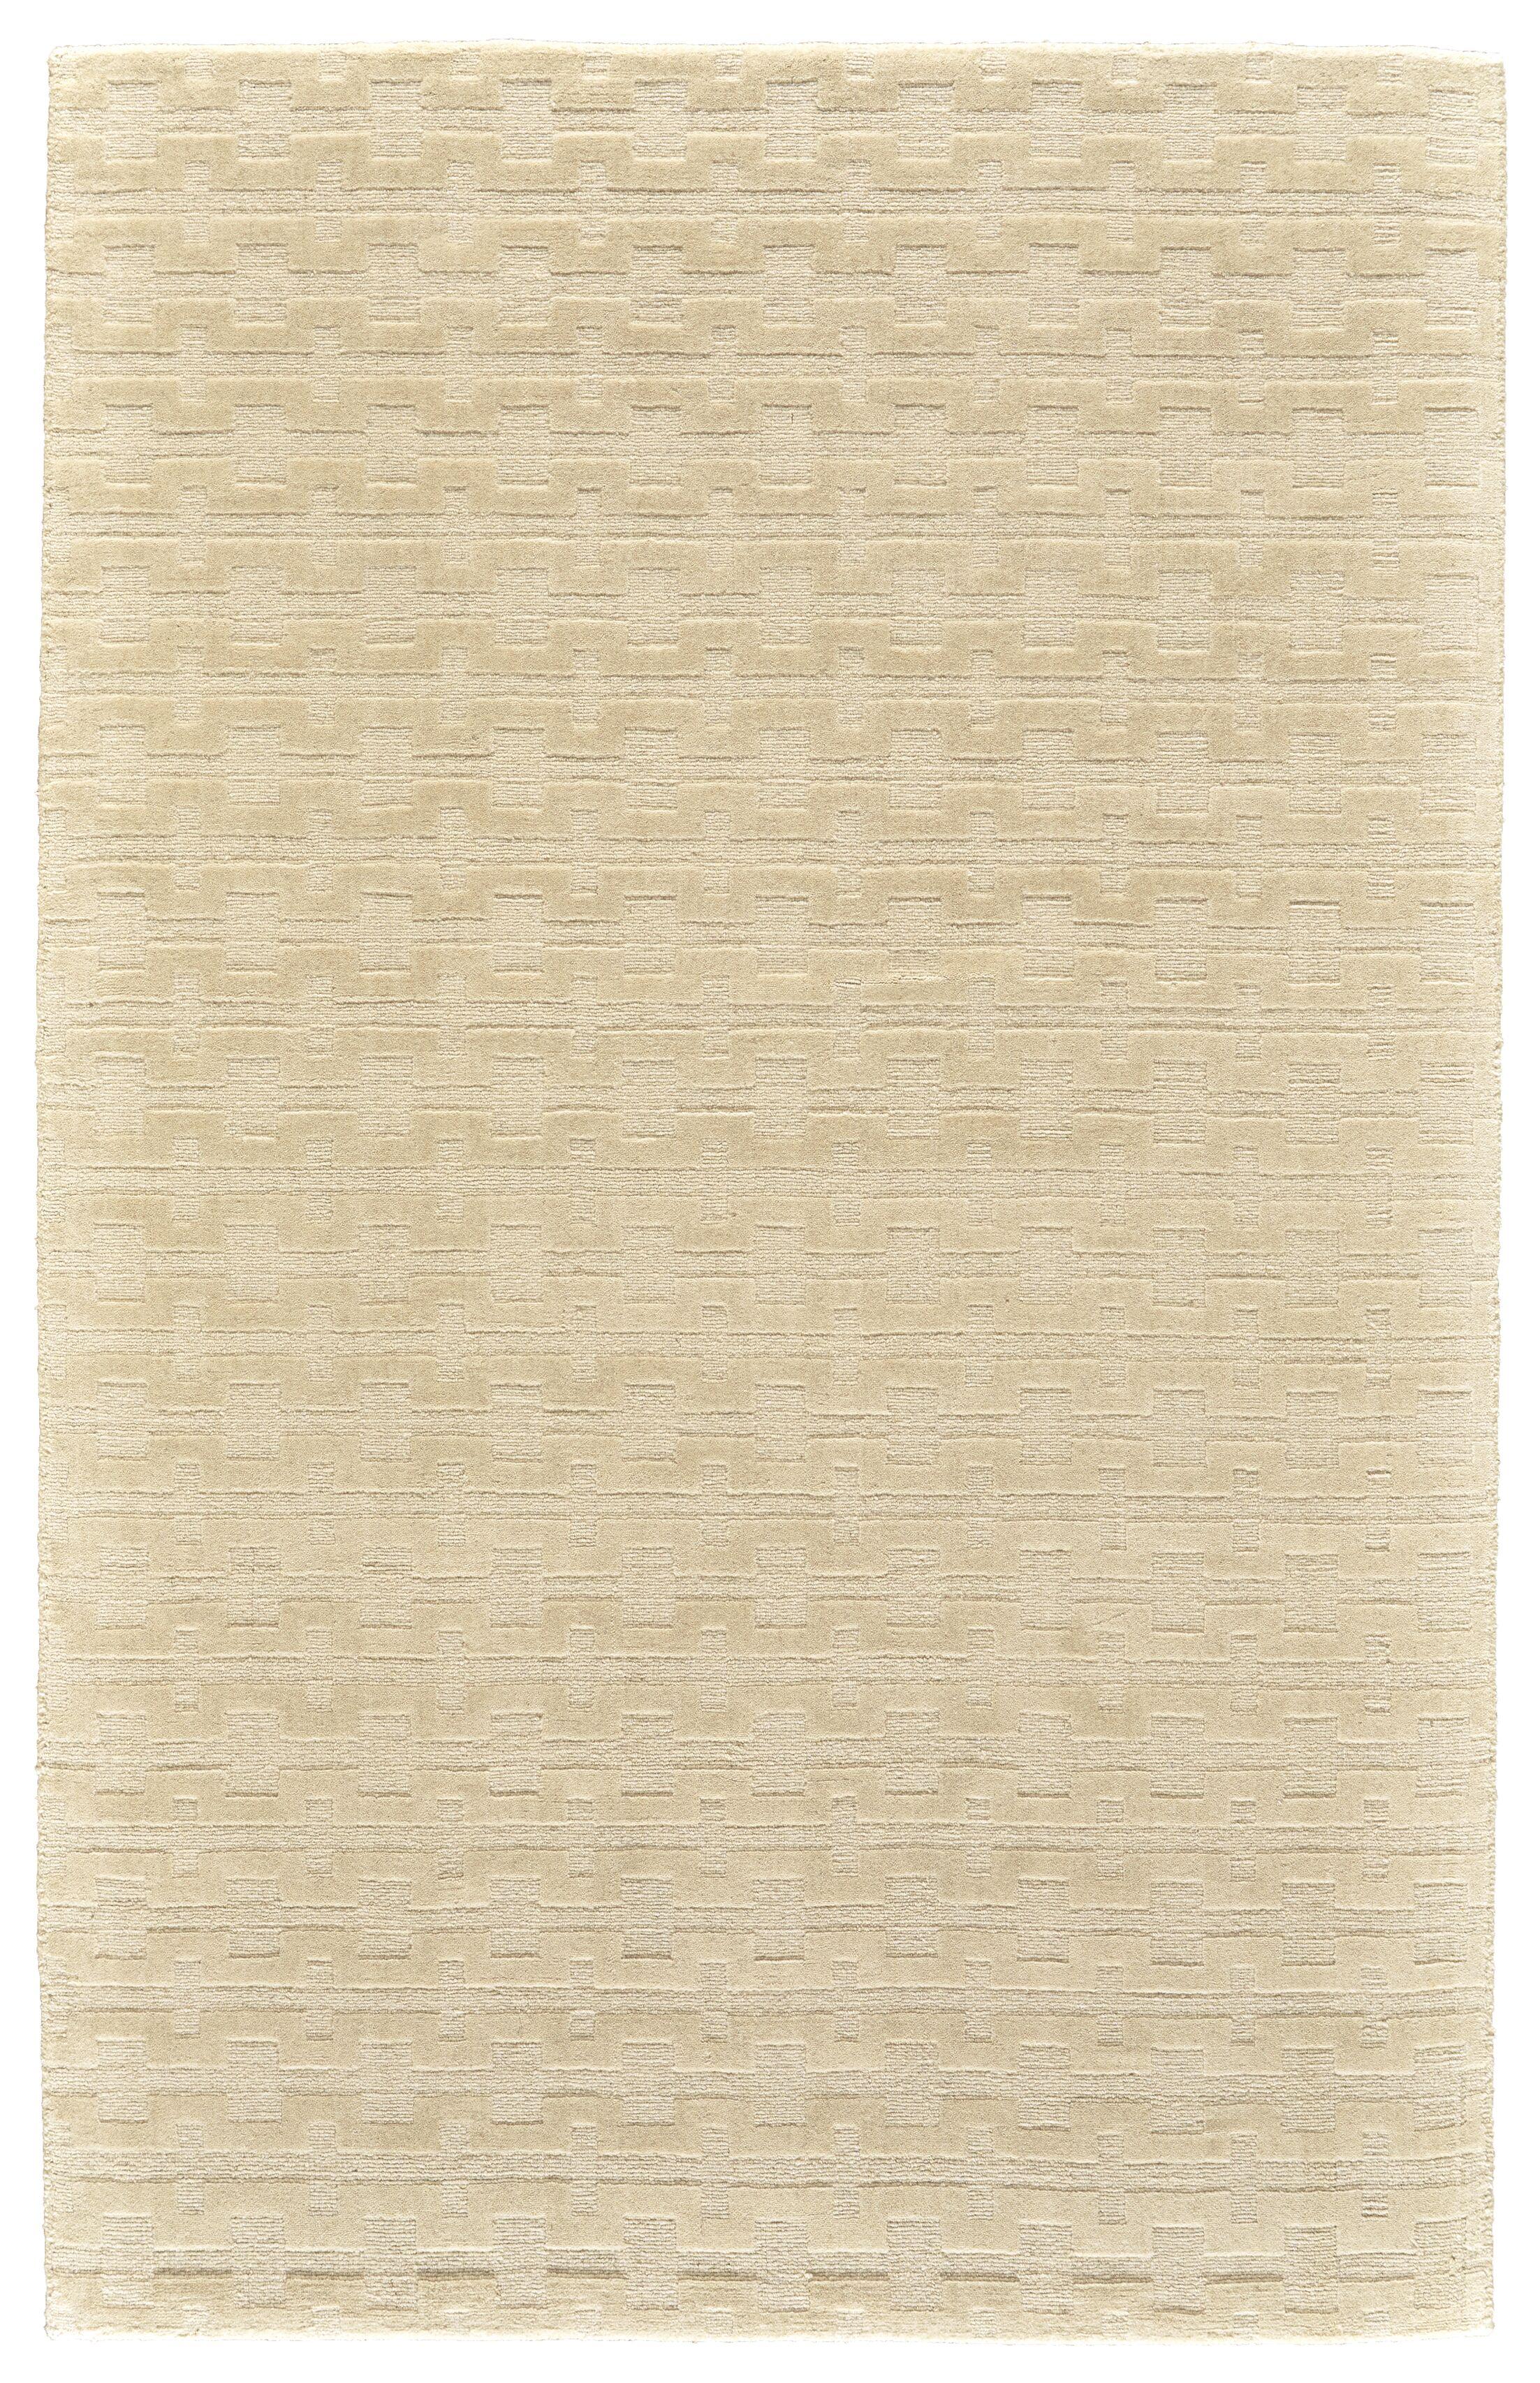 Mcnab Hand-Tufted Wool Cream Area Rug Rug Size: Rectangle 5' x 8'